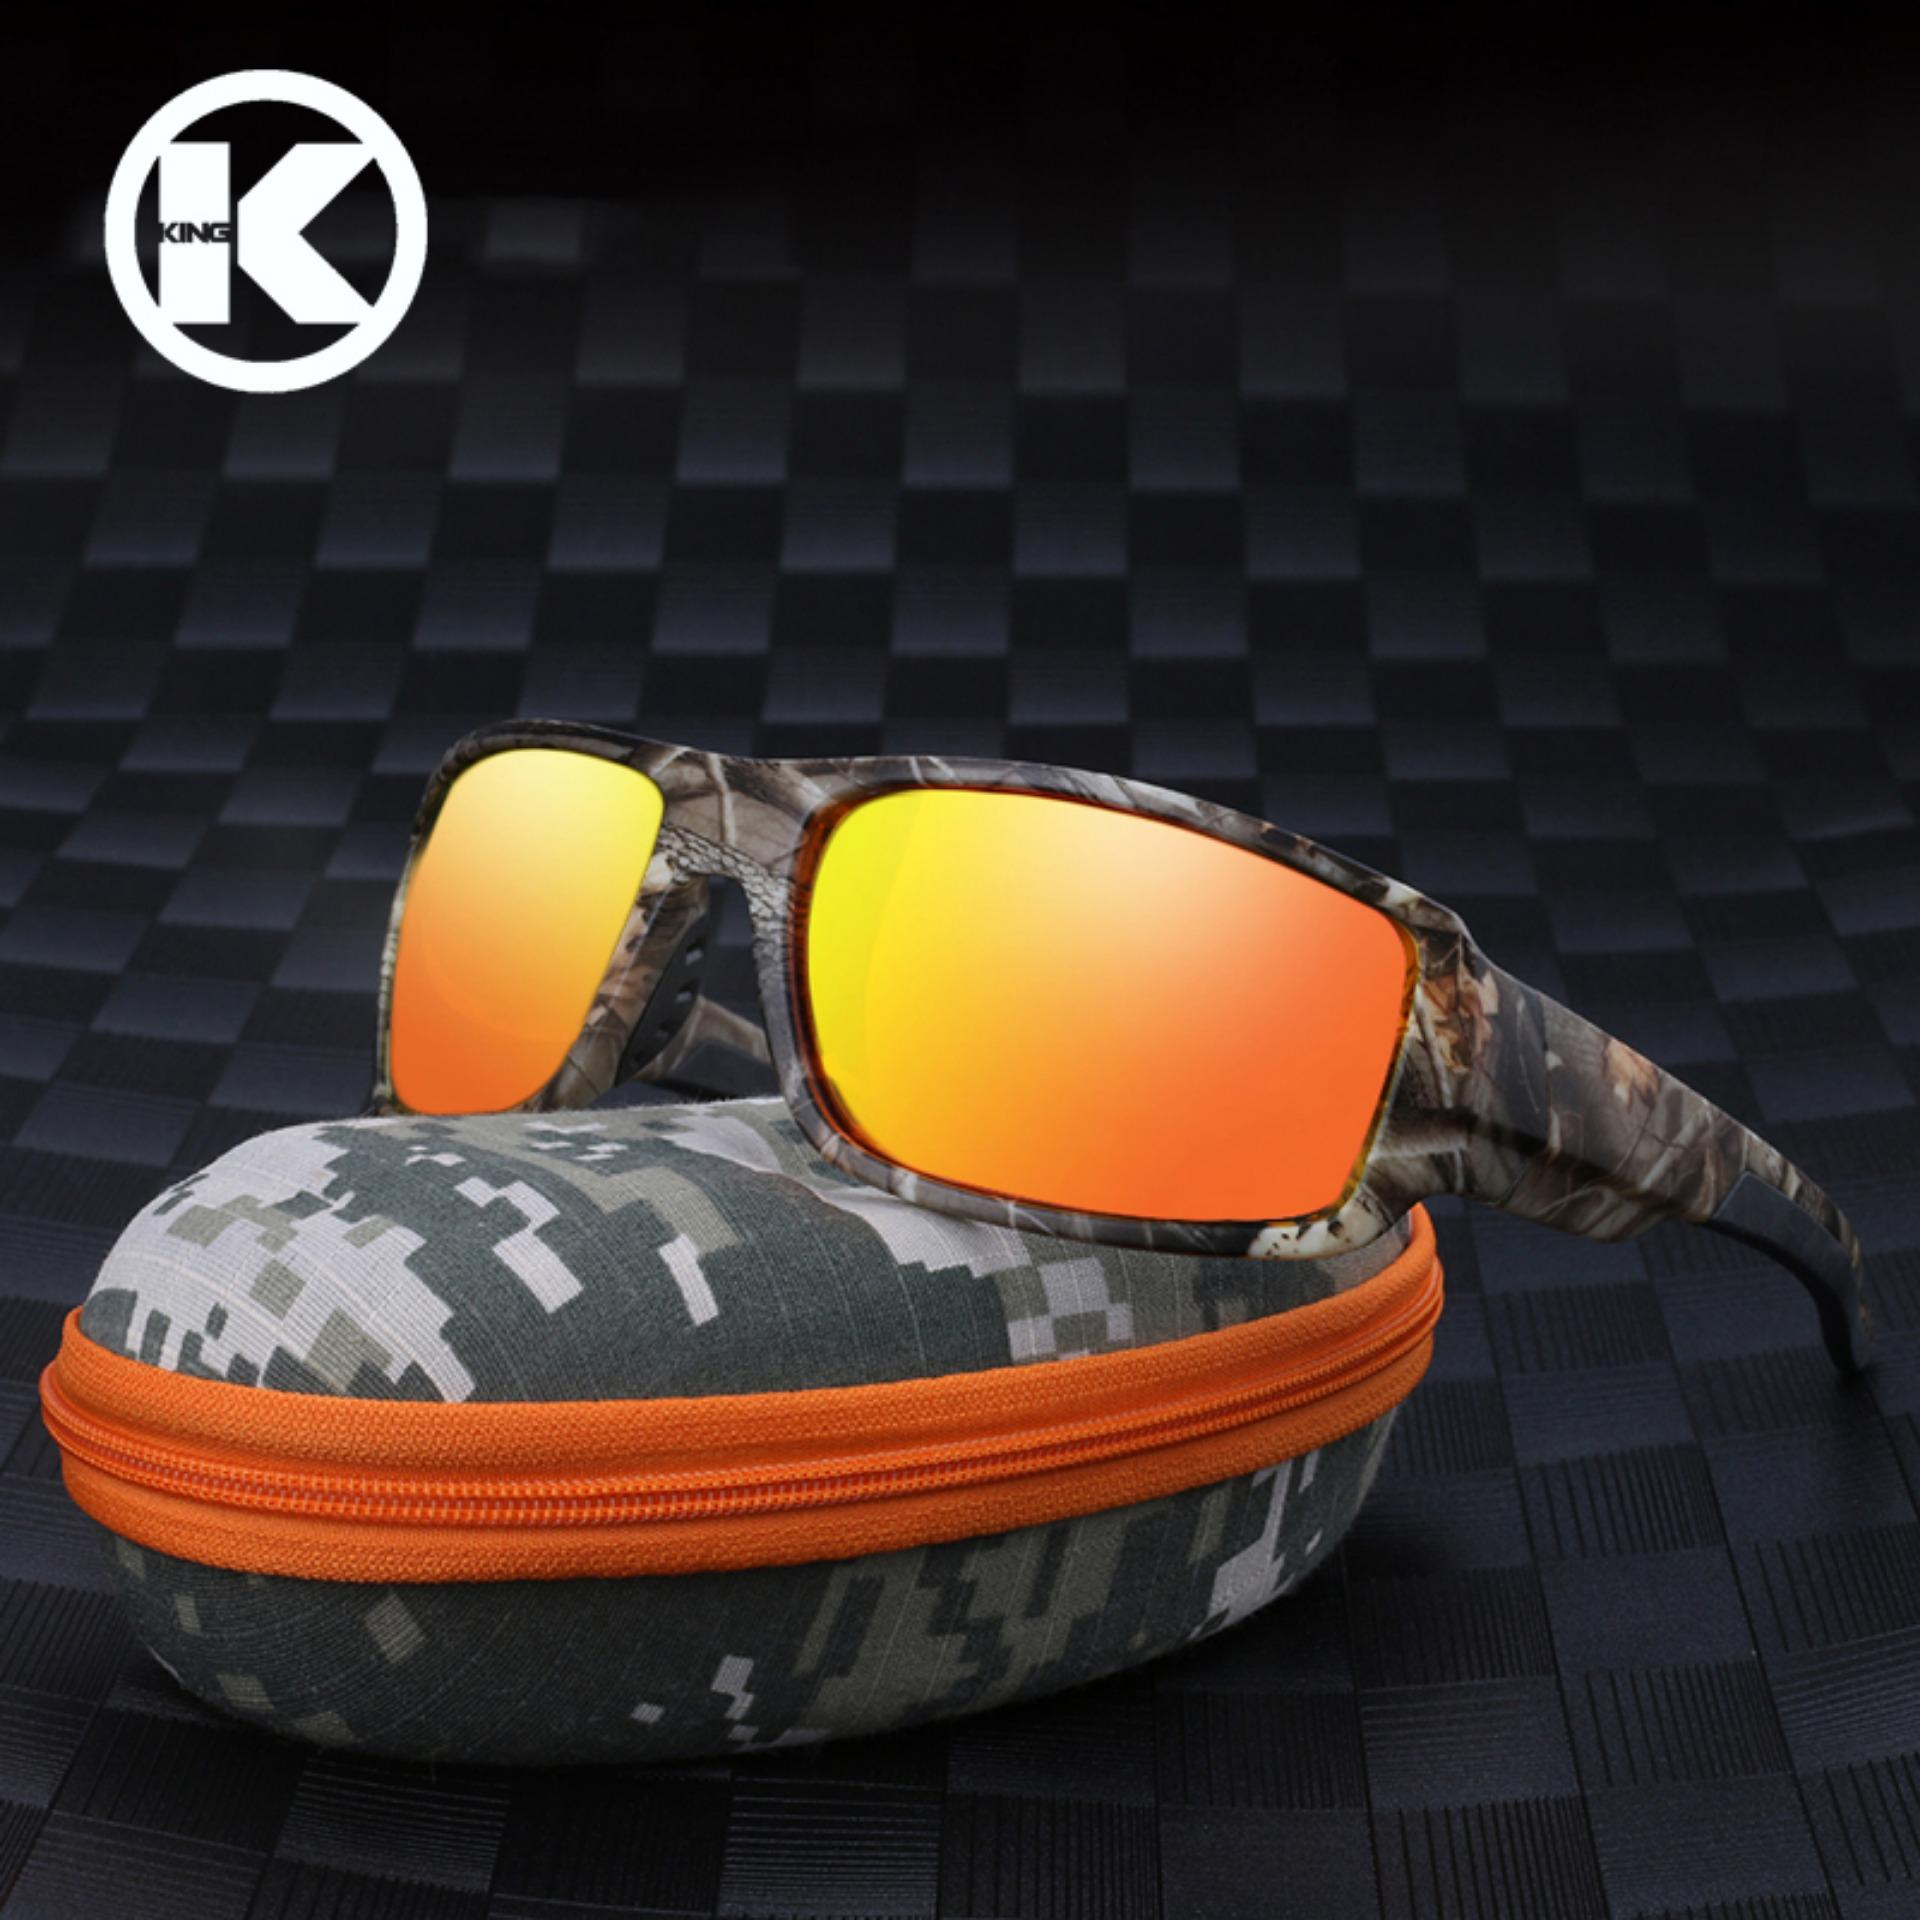 df2637907 Men Polarized Sunglasses Camouflage Frame Sport Sun Glasses Fishing Eyeglasses  Oculos De Sol Masculino - intl